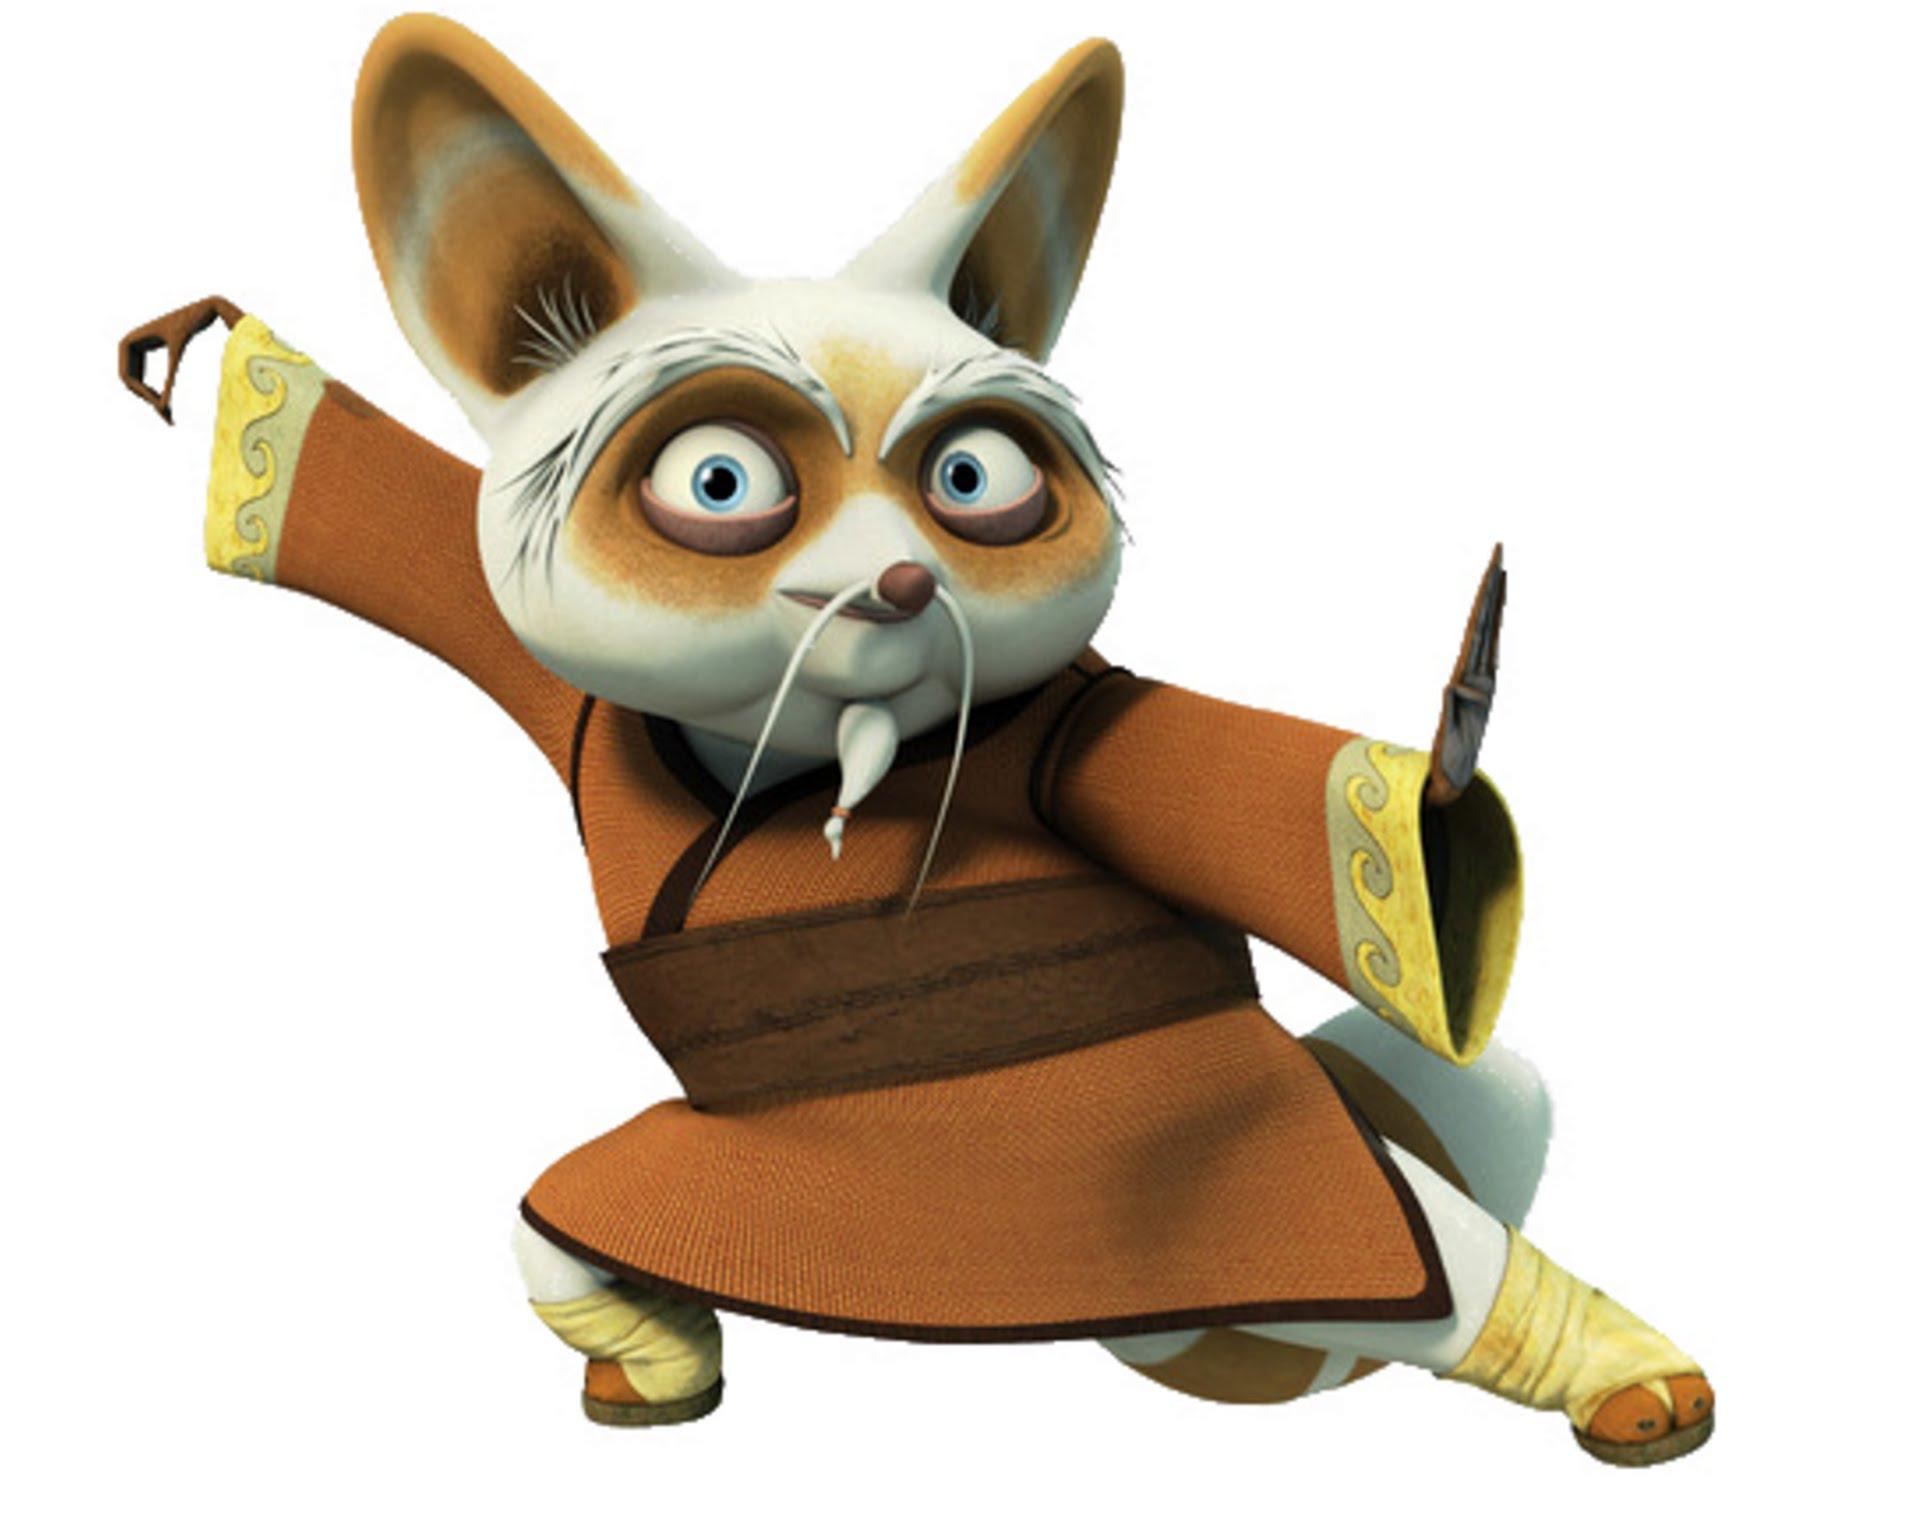 Maters clipart kung fu panda  Sifu Coloring Panda YouTube